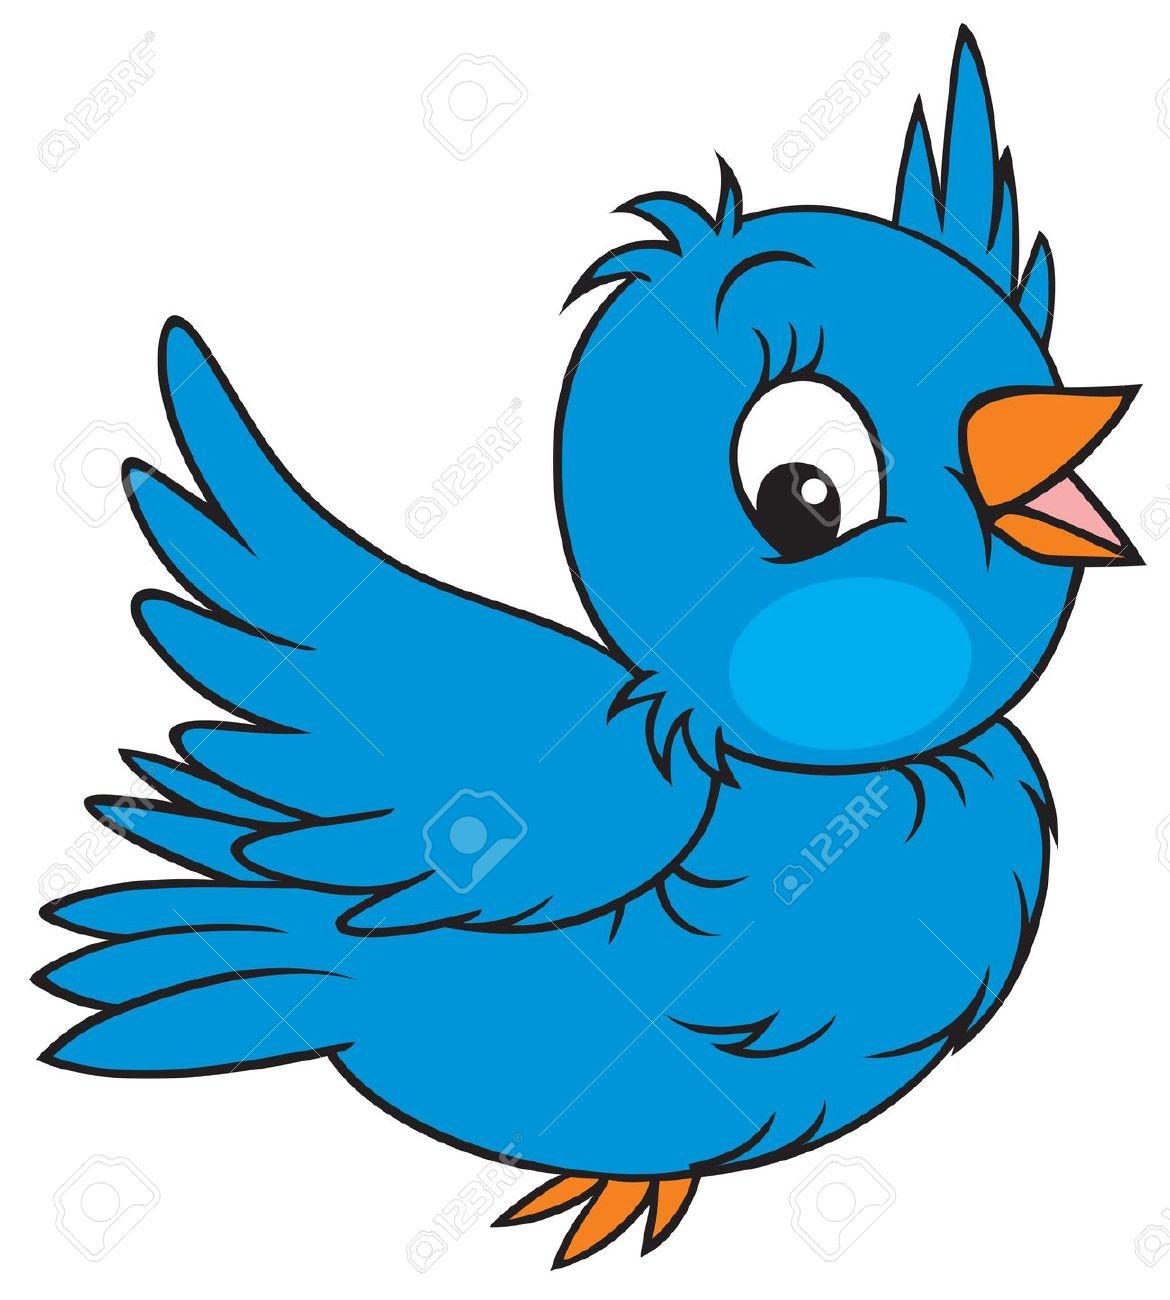 Bluebird clipart flying Clipart Bird Clipart Free Images